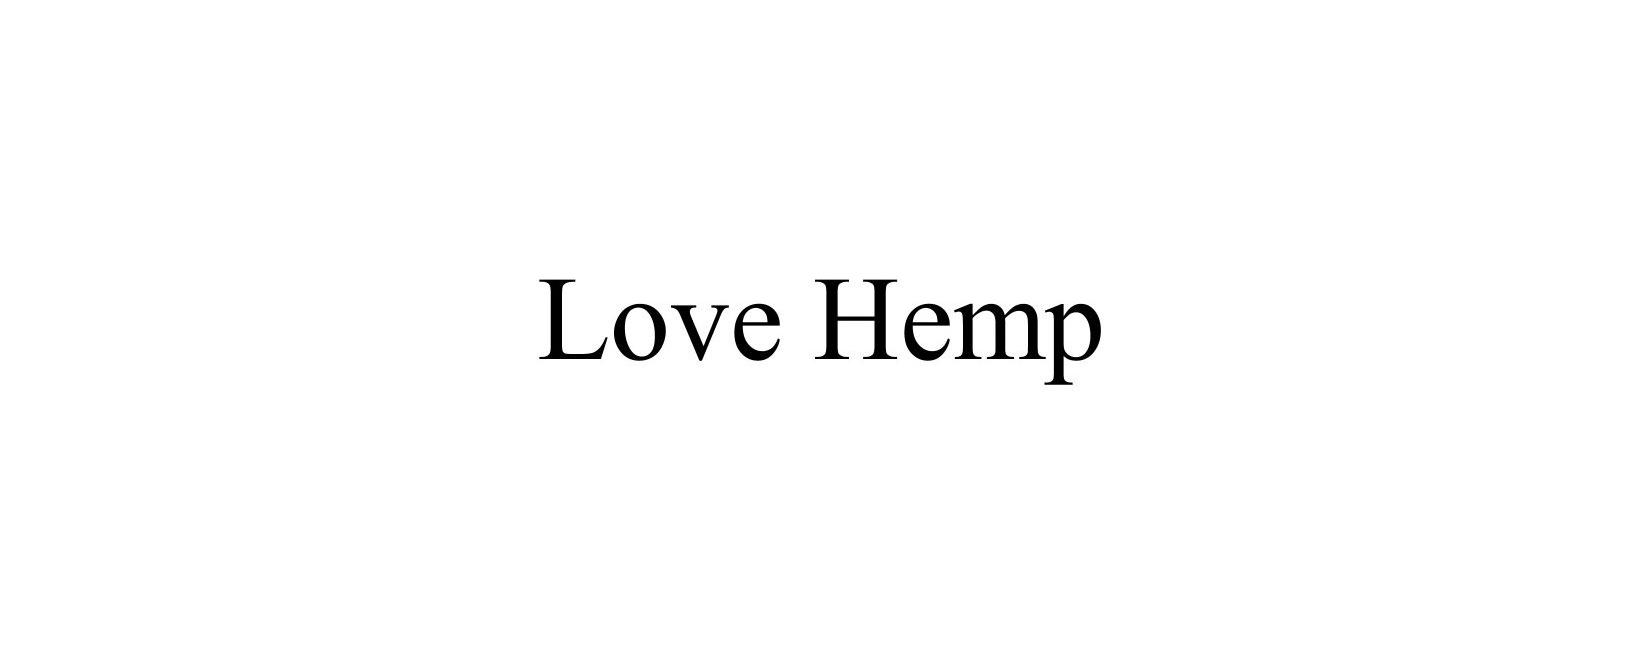 Love Hemp Discount Code 2021